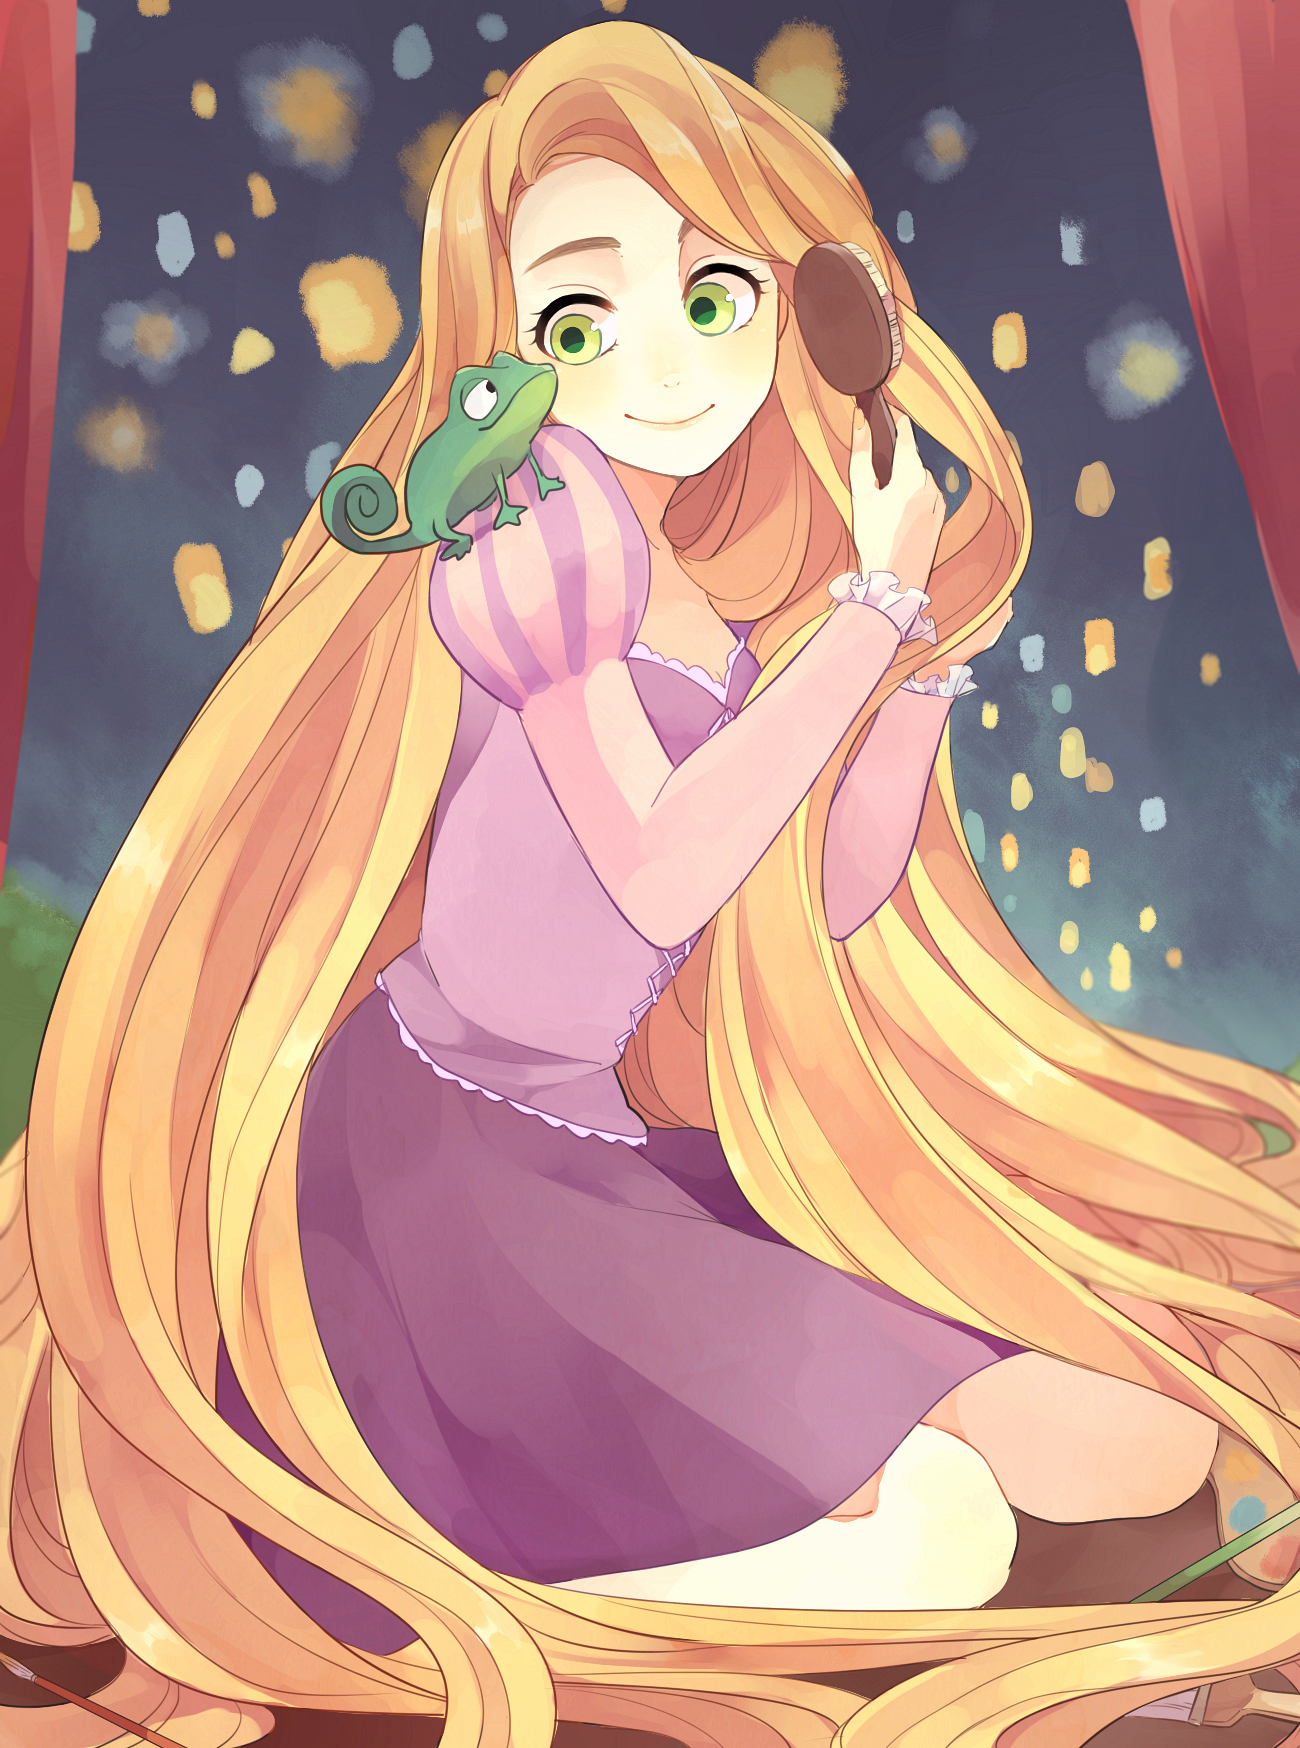 Rapunzel Tangled Tangled Disney Image 1694546 Zerochan Anime Image Board